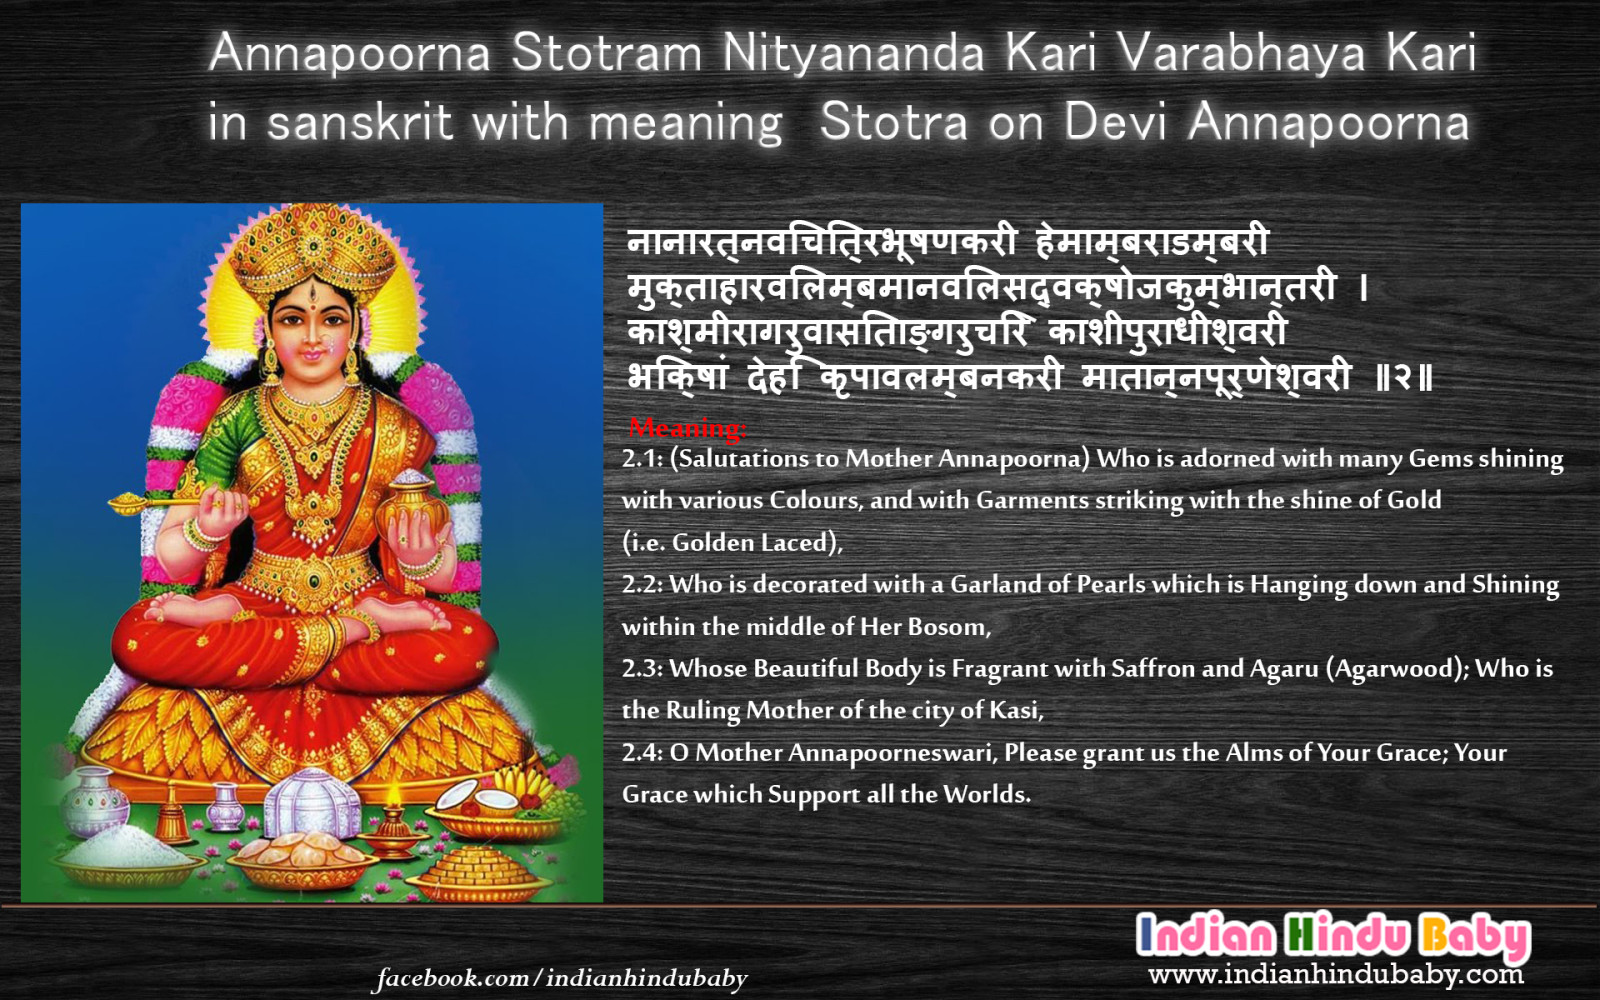 Annapoorna Stotram Nityananda Kari Varabhaya Kari in sanskrit with meaning Stotra on Devi Annapoorna-2